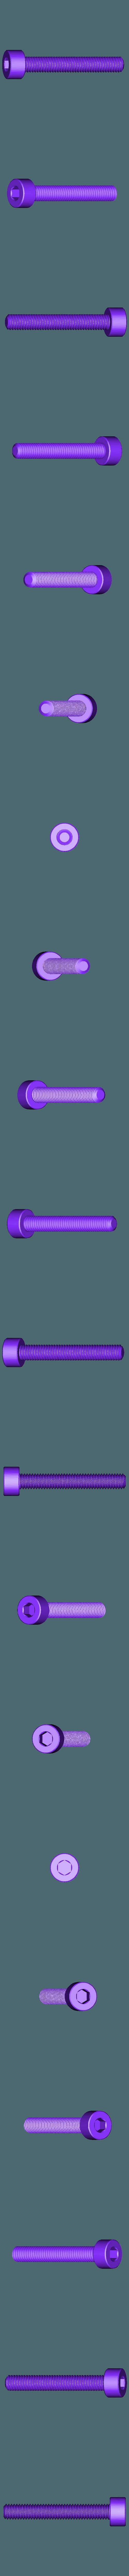 M3_Screw.stl Download free STL file Star Wars Naboo S5 Heavy Blaster Pistol • 3D printing design, Dsk